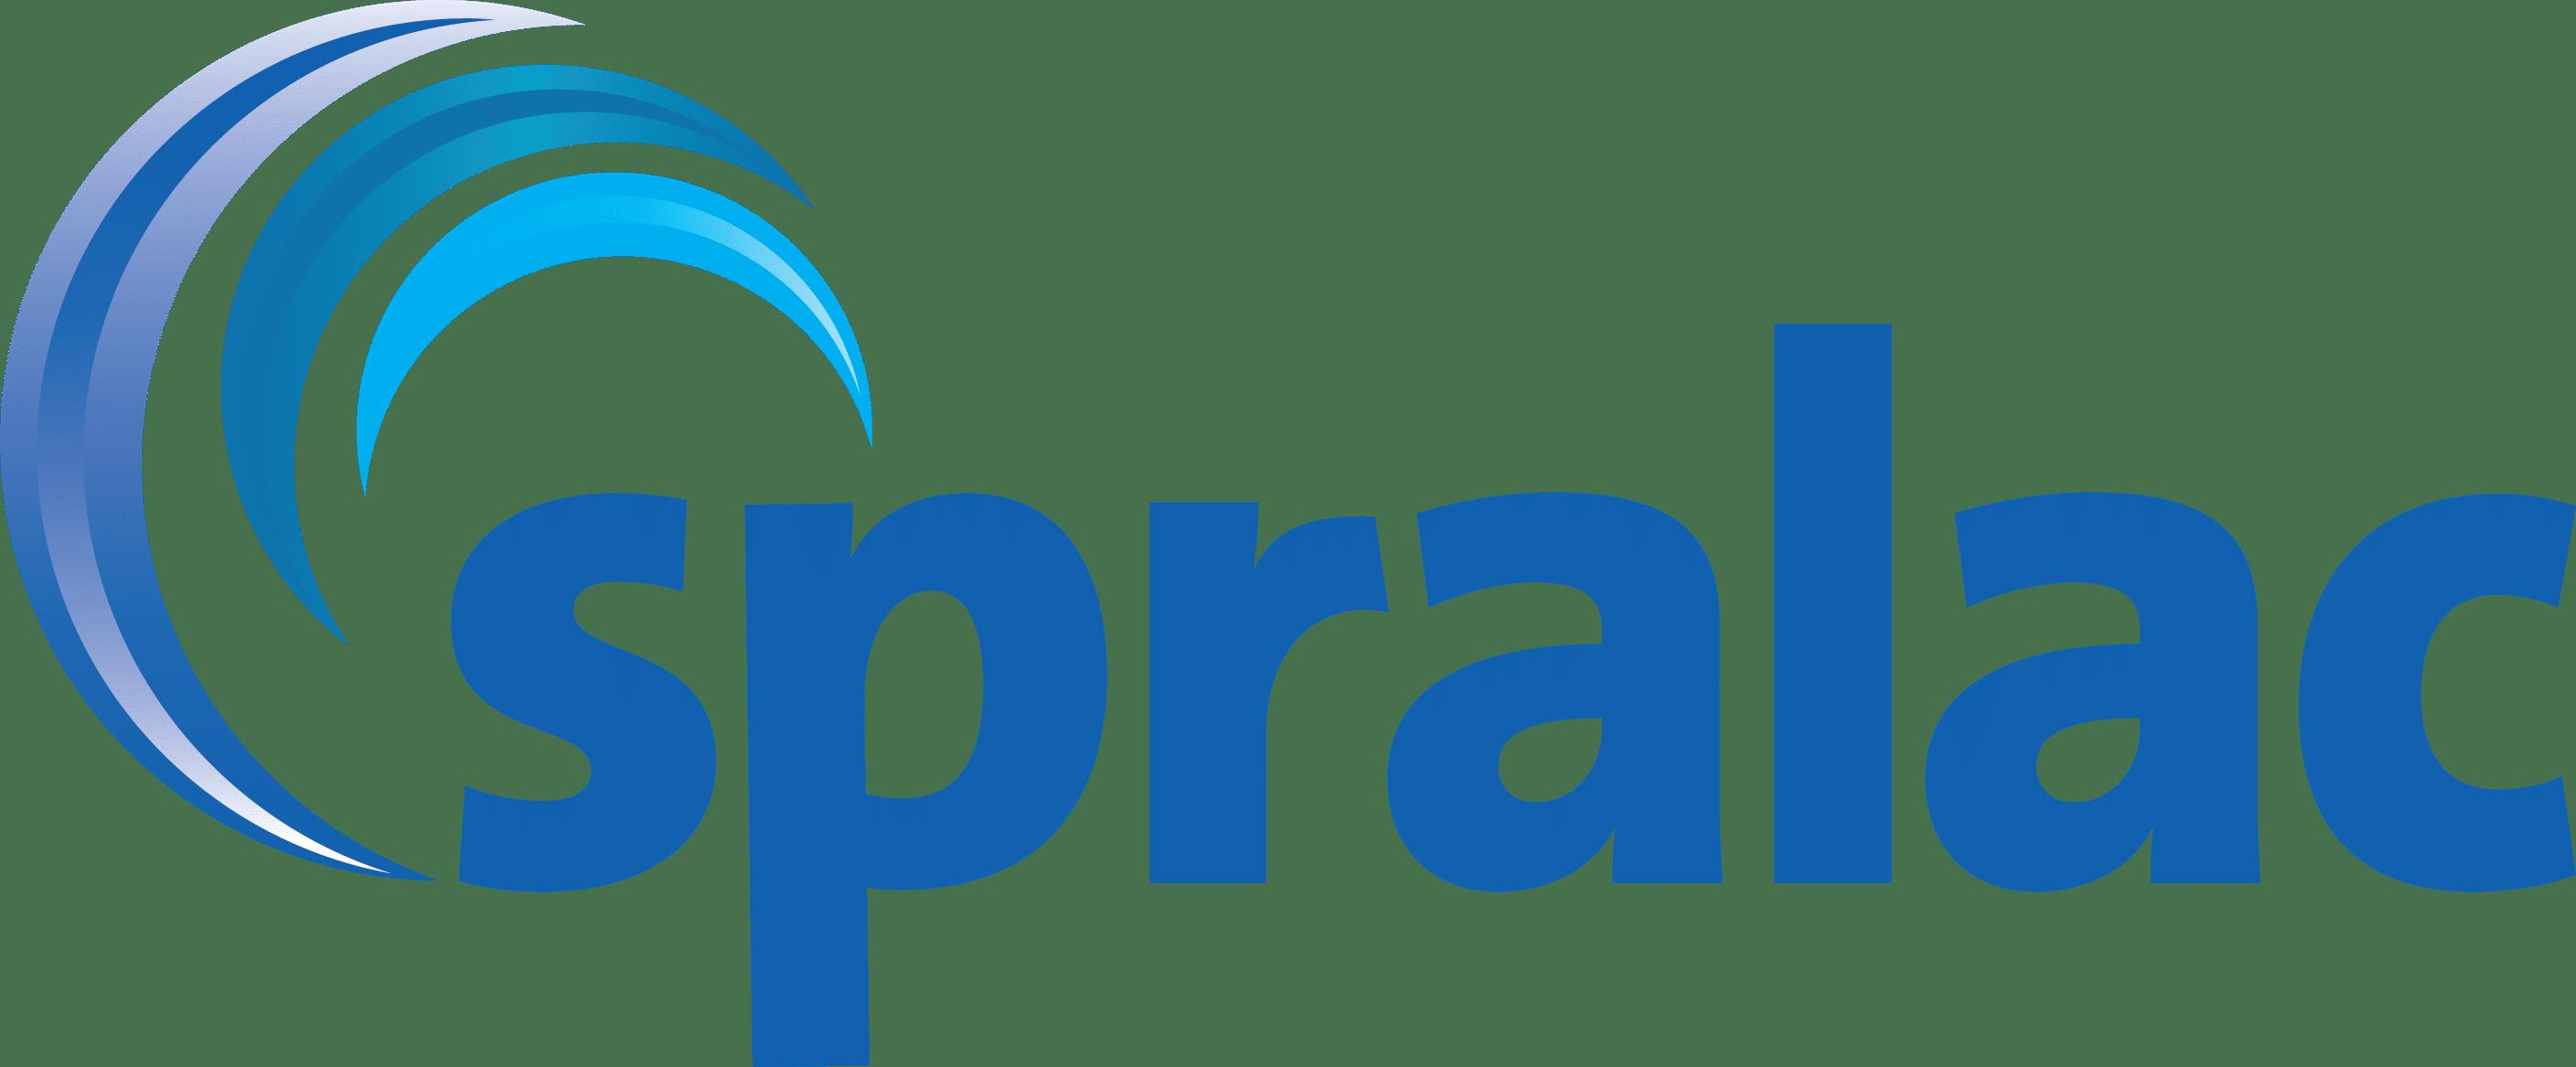 Spralac- подготвителни продукти